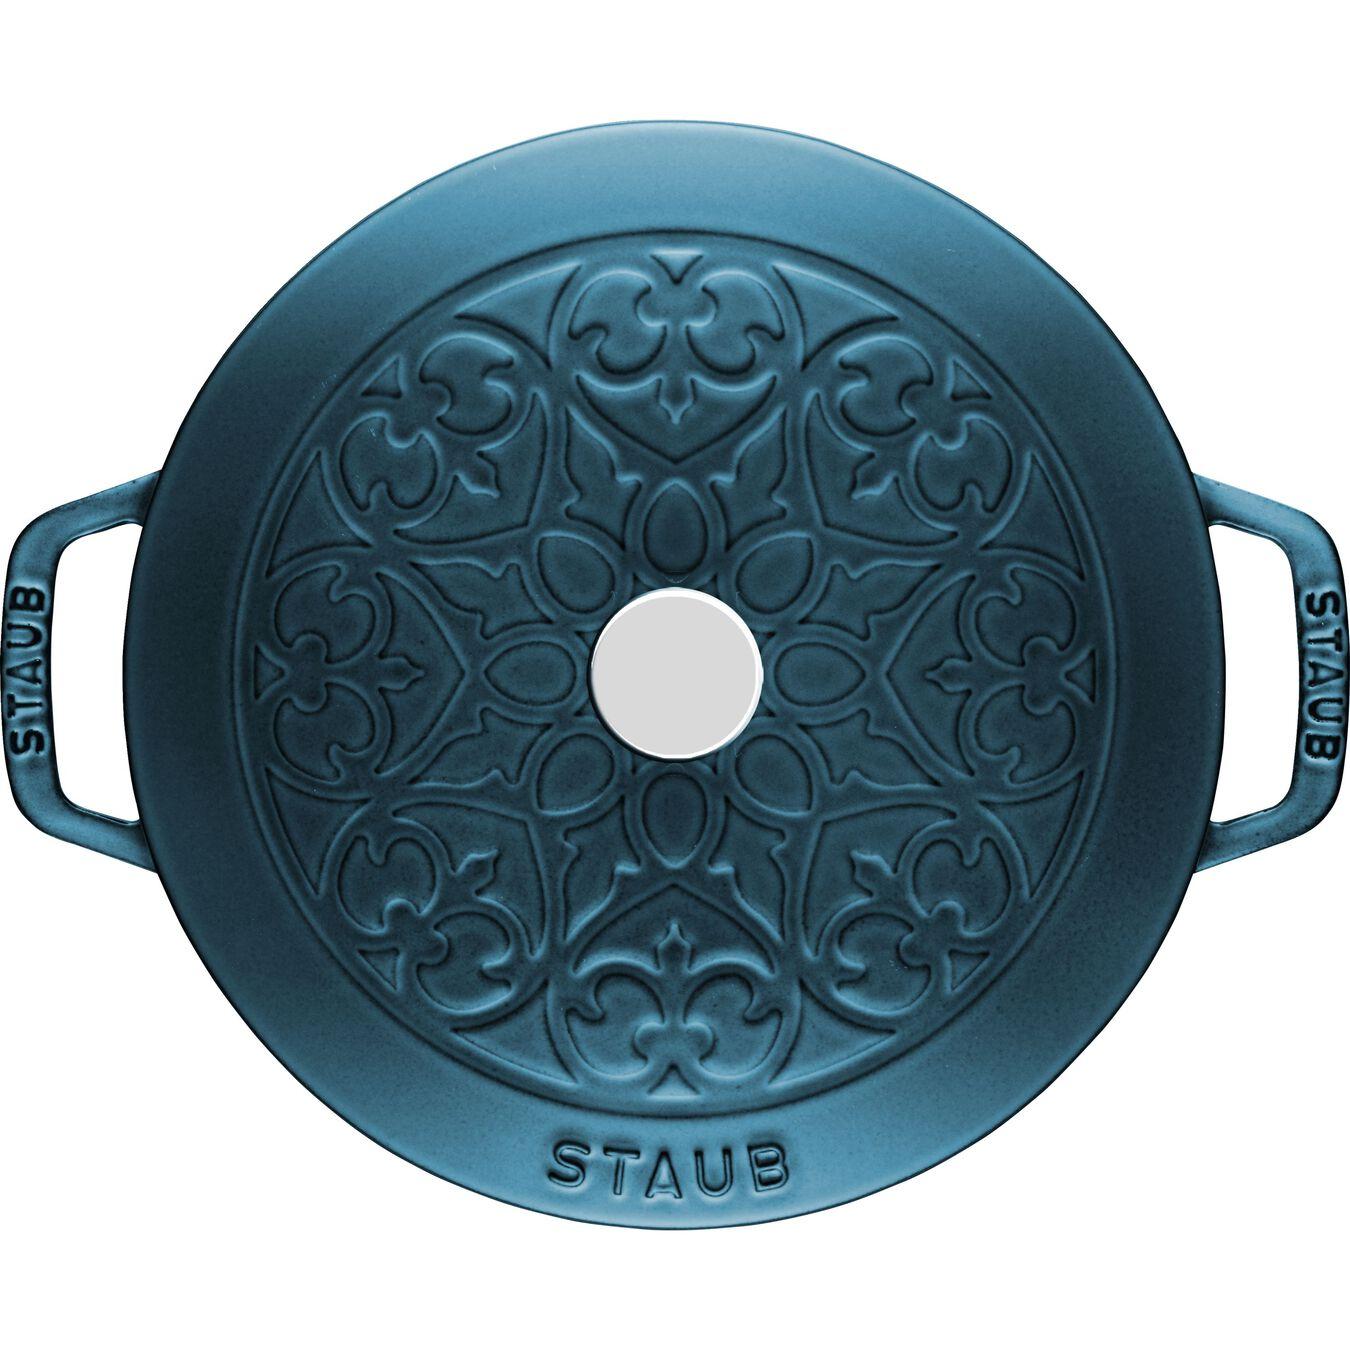 Pot set, lily decal, 2 Piece   round   cast iron   la-mer,,large 3